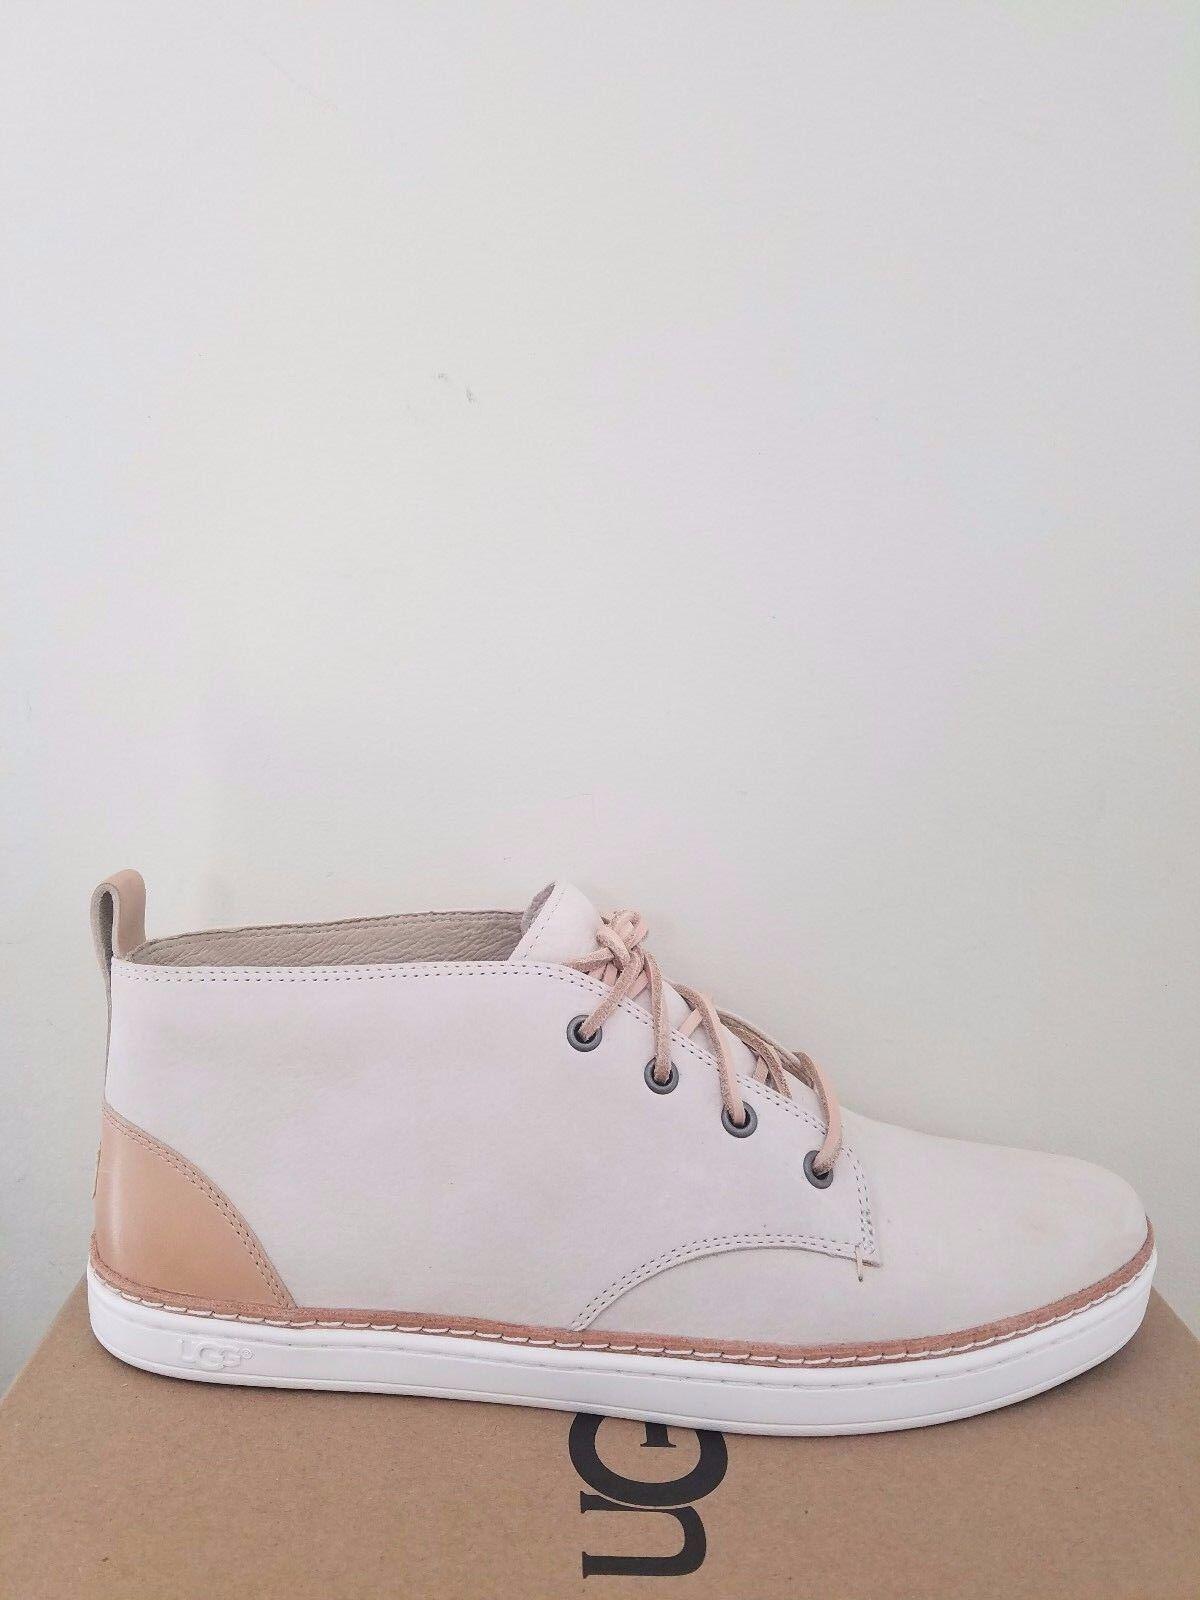 Ugg Australia Womens Kallisto Sneakers Size 8 NIB